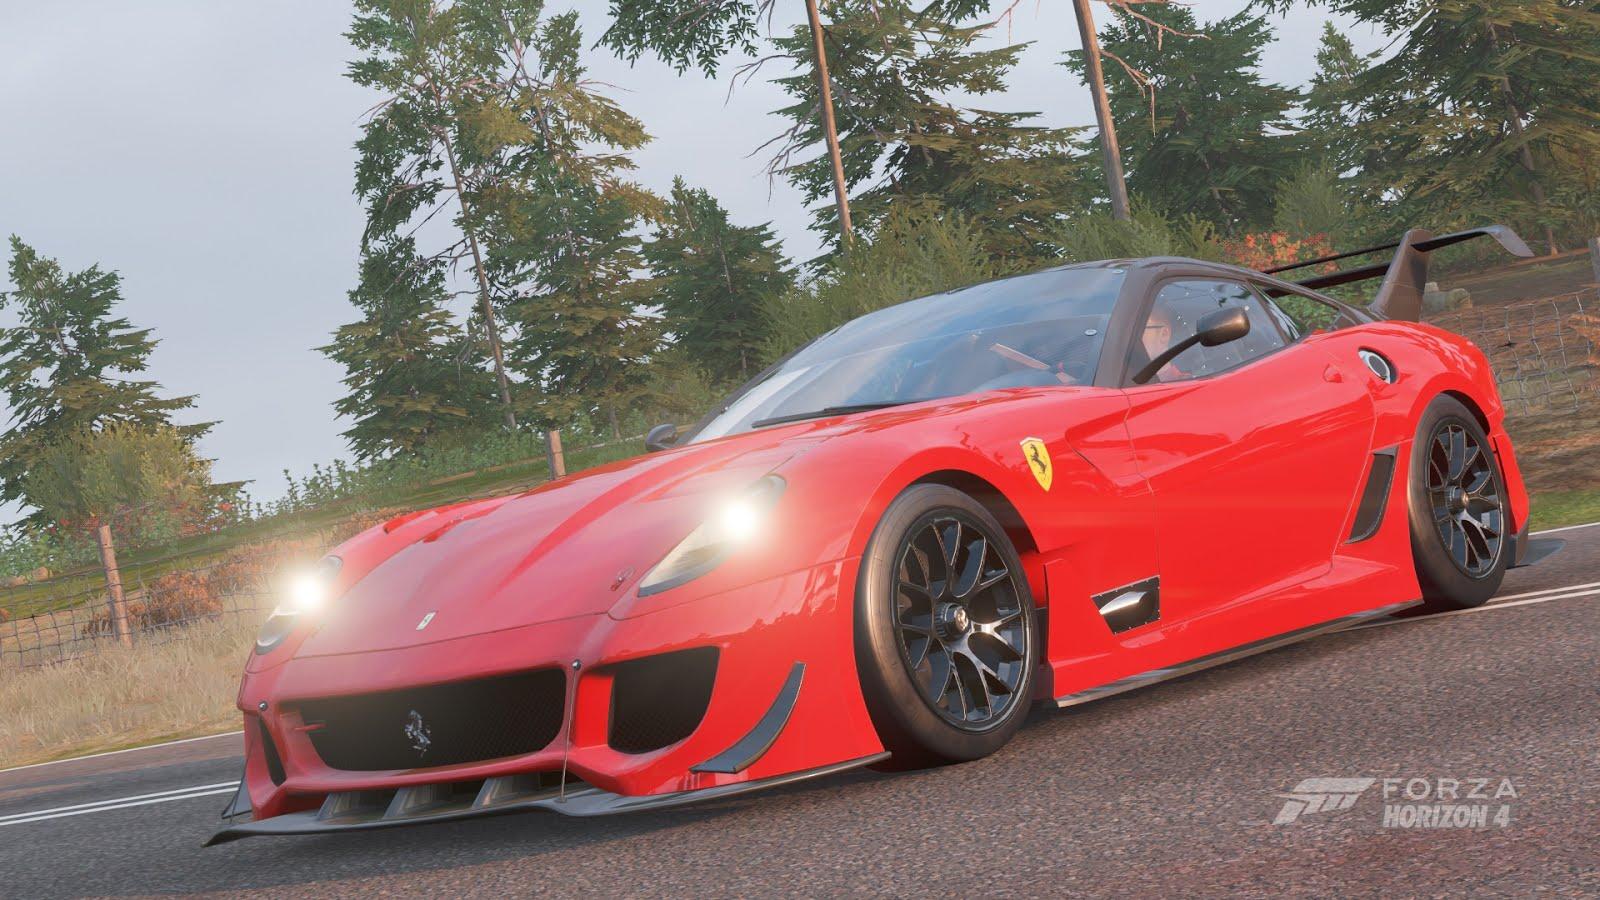 Leopaul S Blog Forza Horizon 4 The Ferrari 599xx Evo